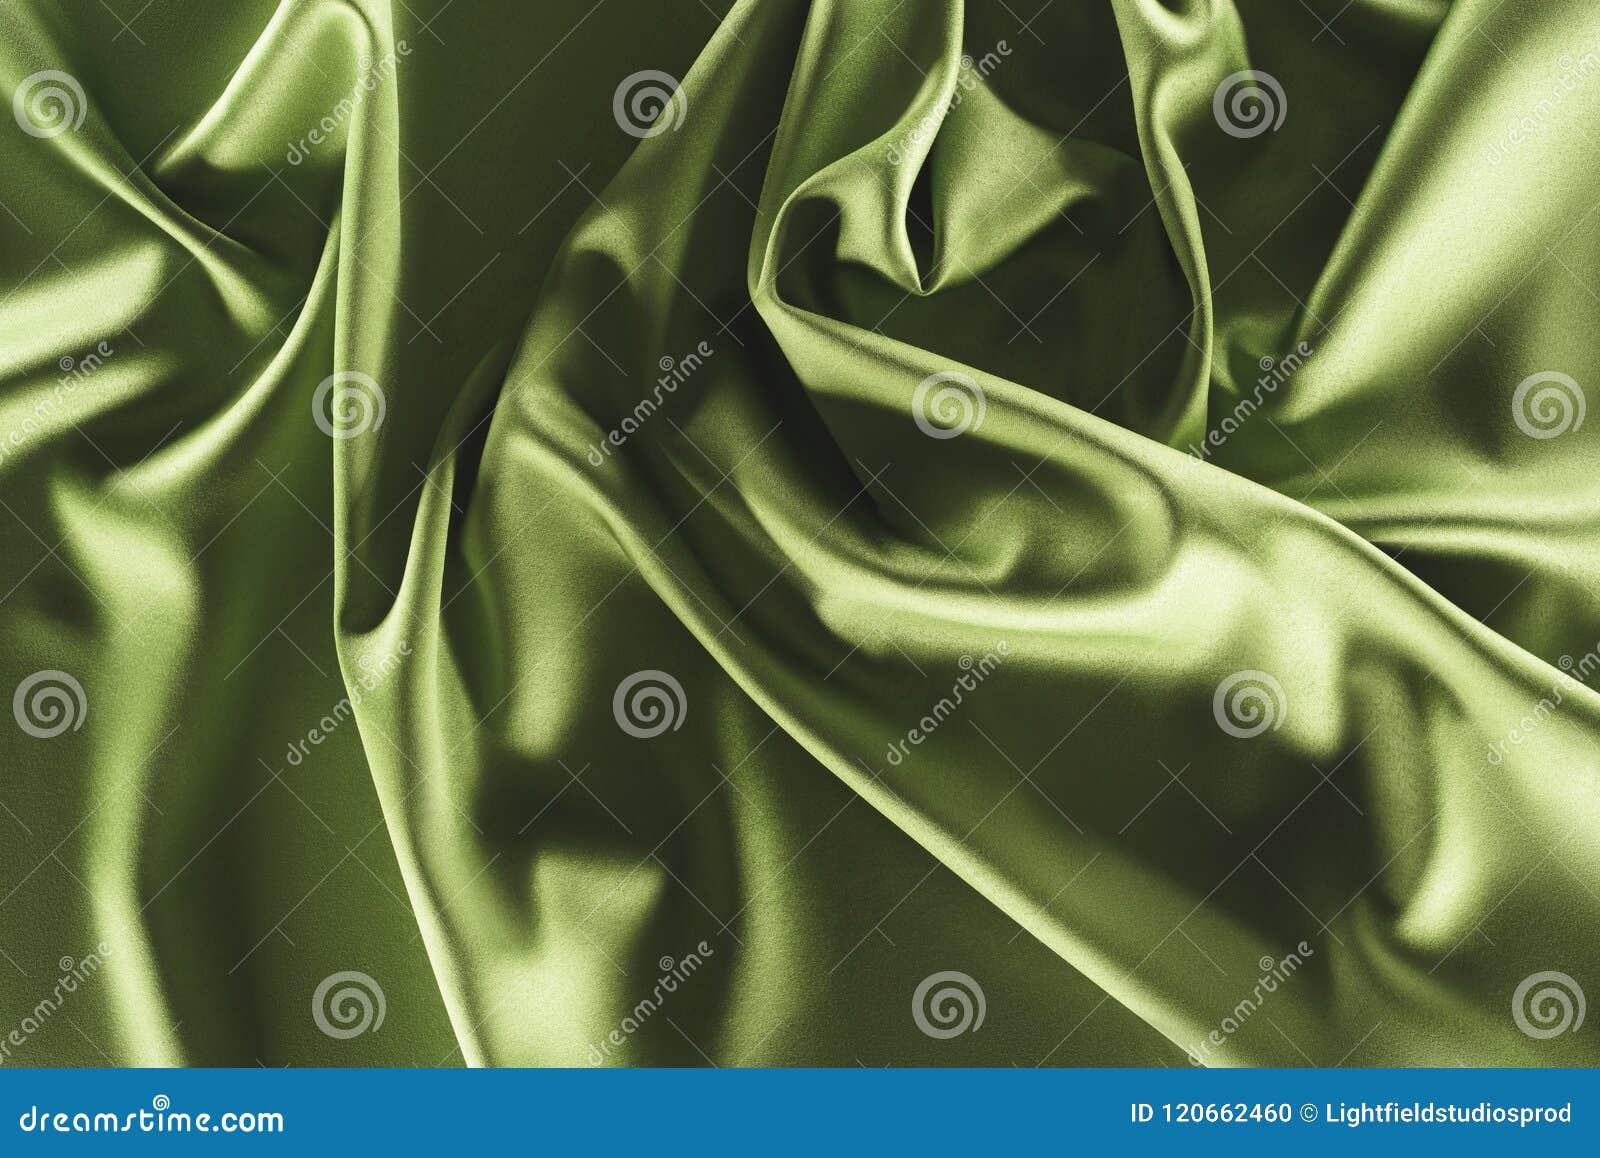 close up view of elegant green silk cloth